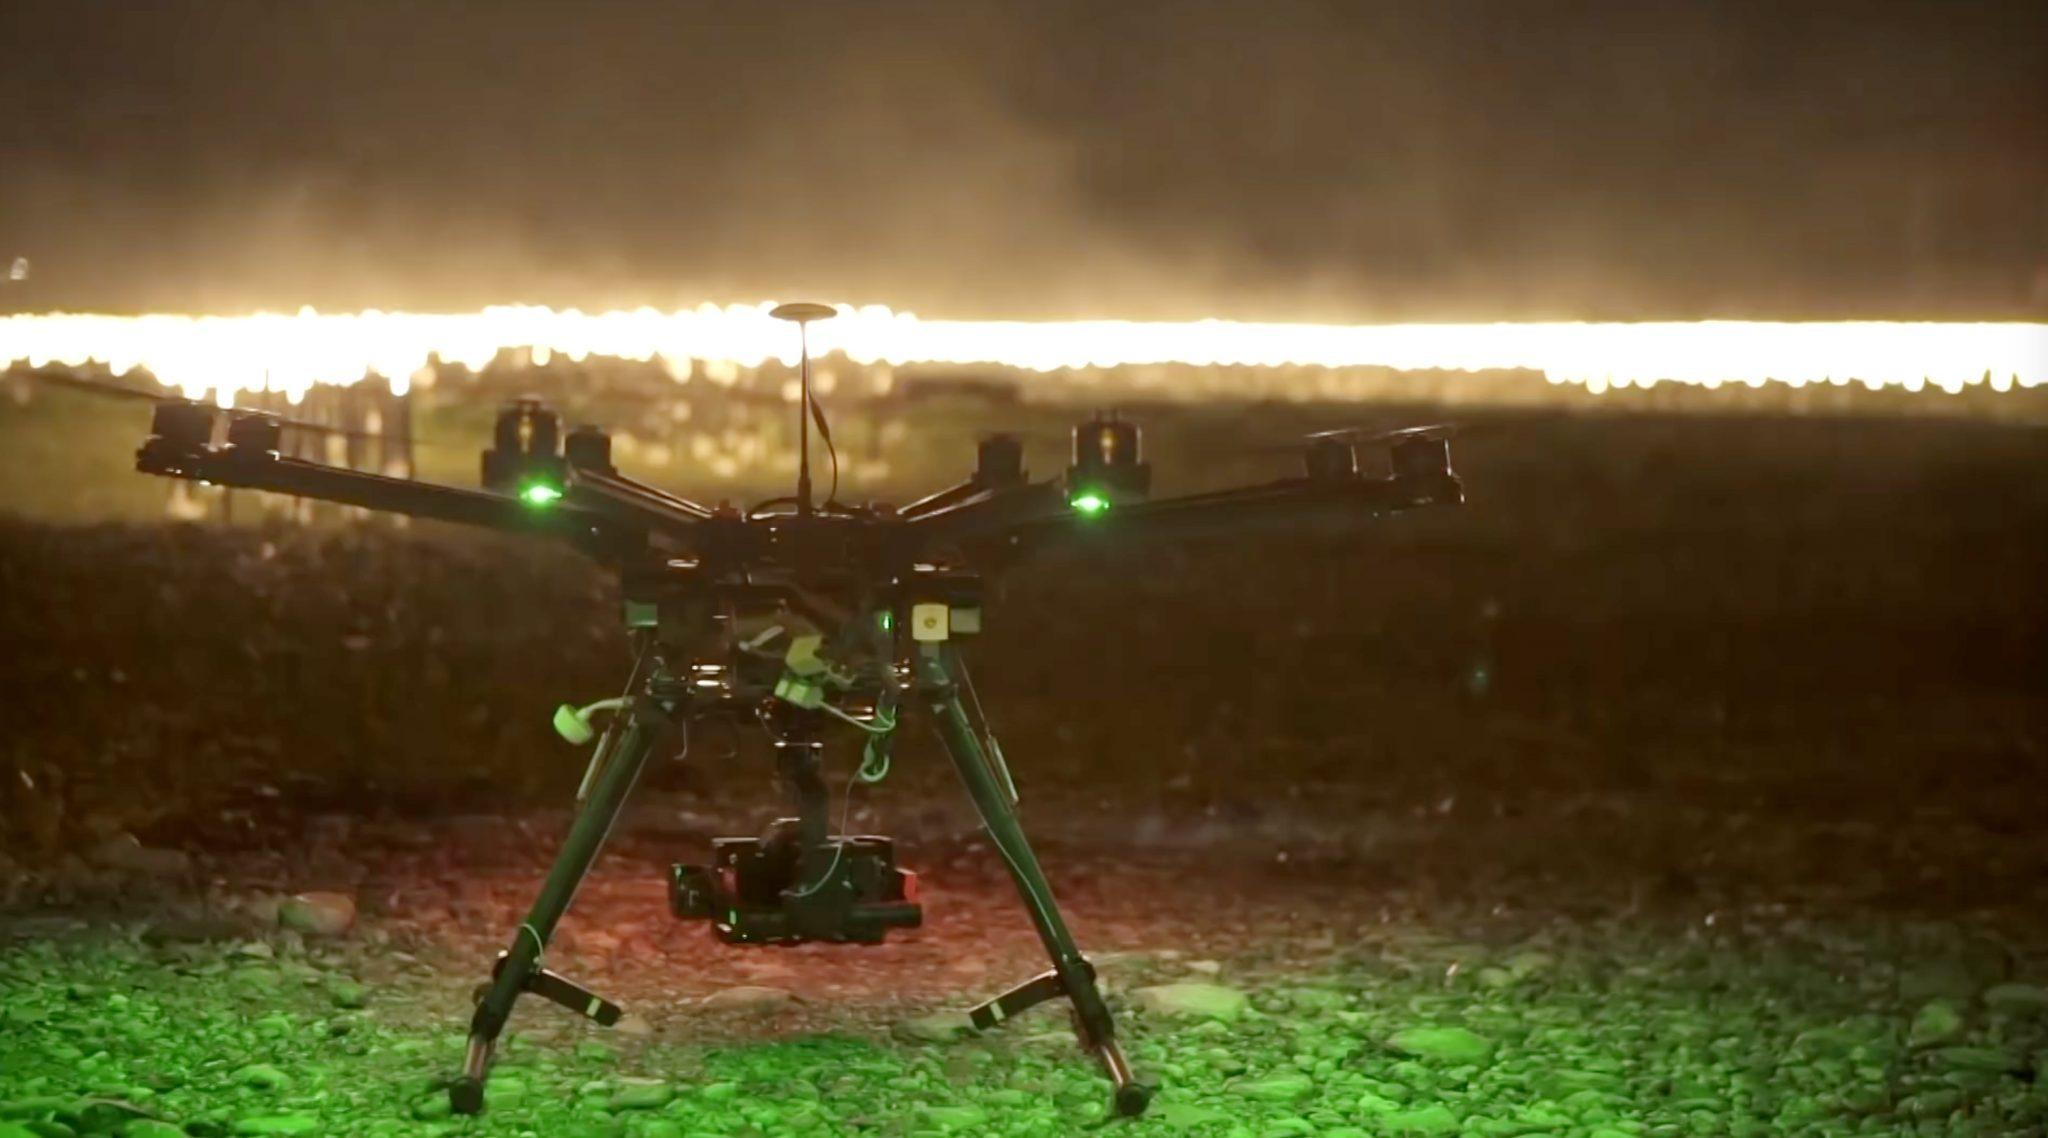 Drohne Muenchen Drone Munich Flug